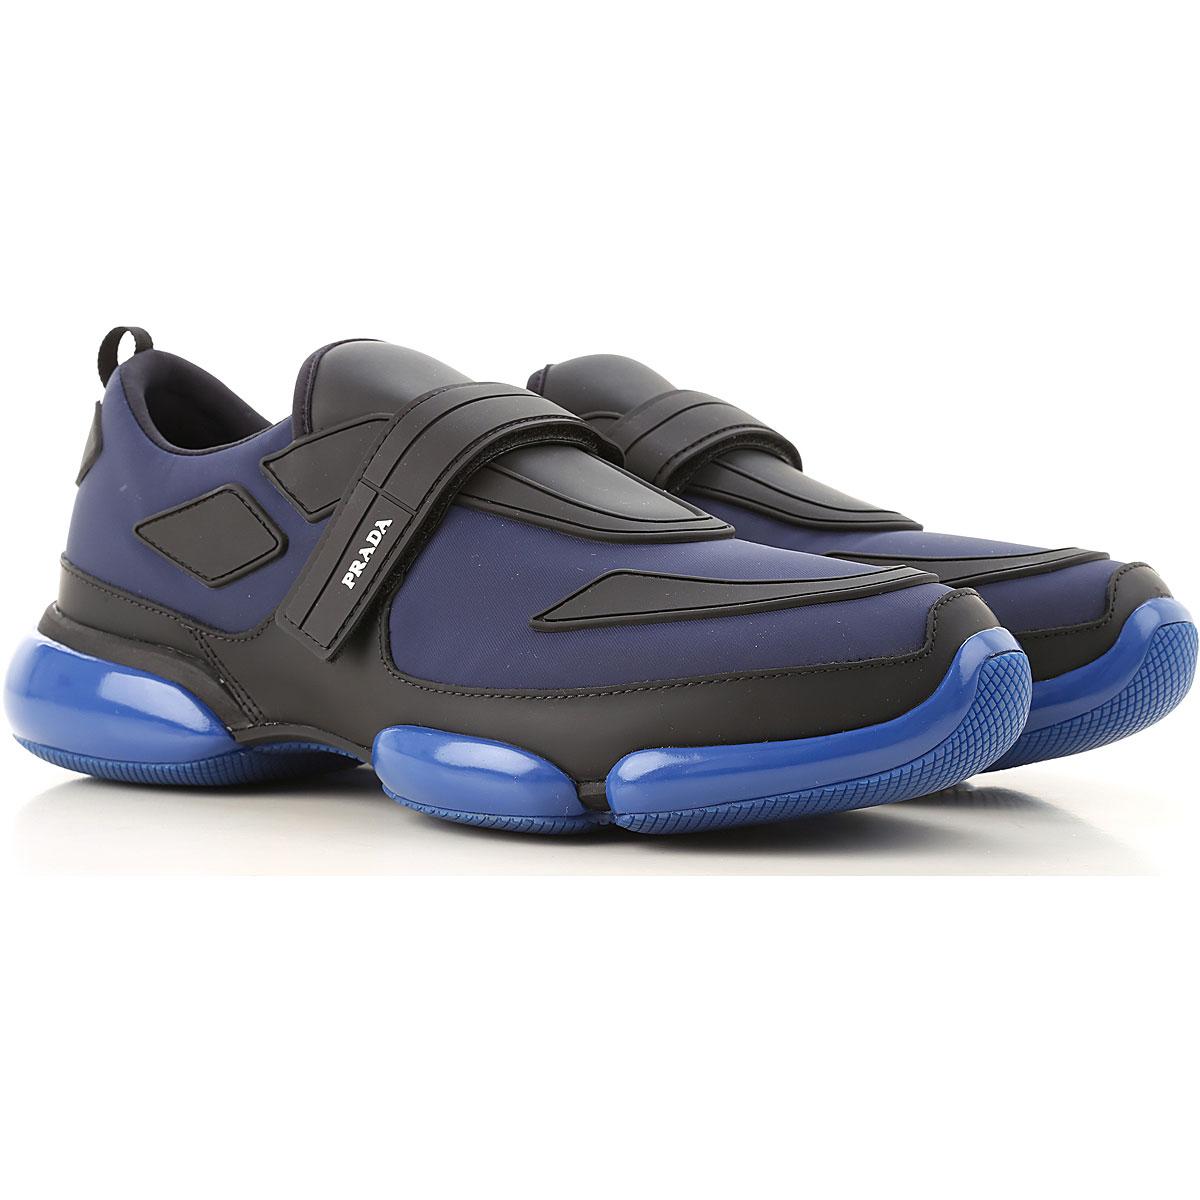 Prada Sneaker Homme Pas cher en Soldes, Noir, Cuir, 2019, 10 11 7 8 9